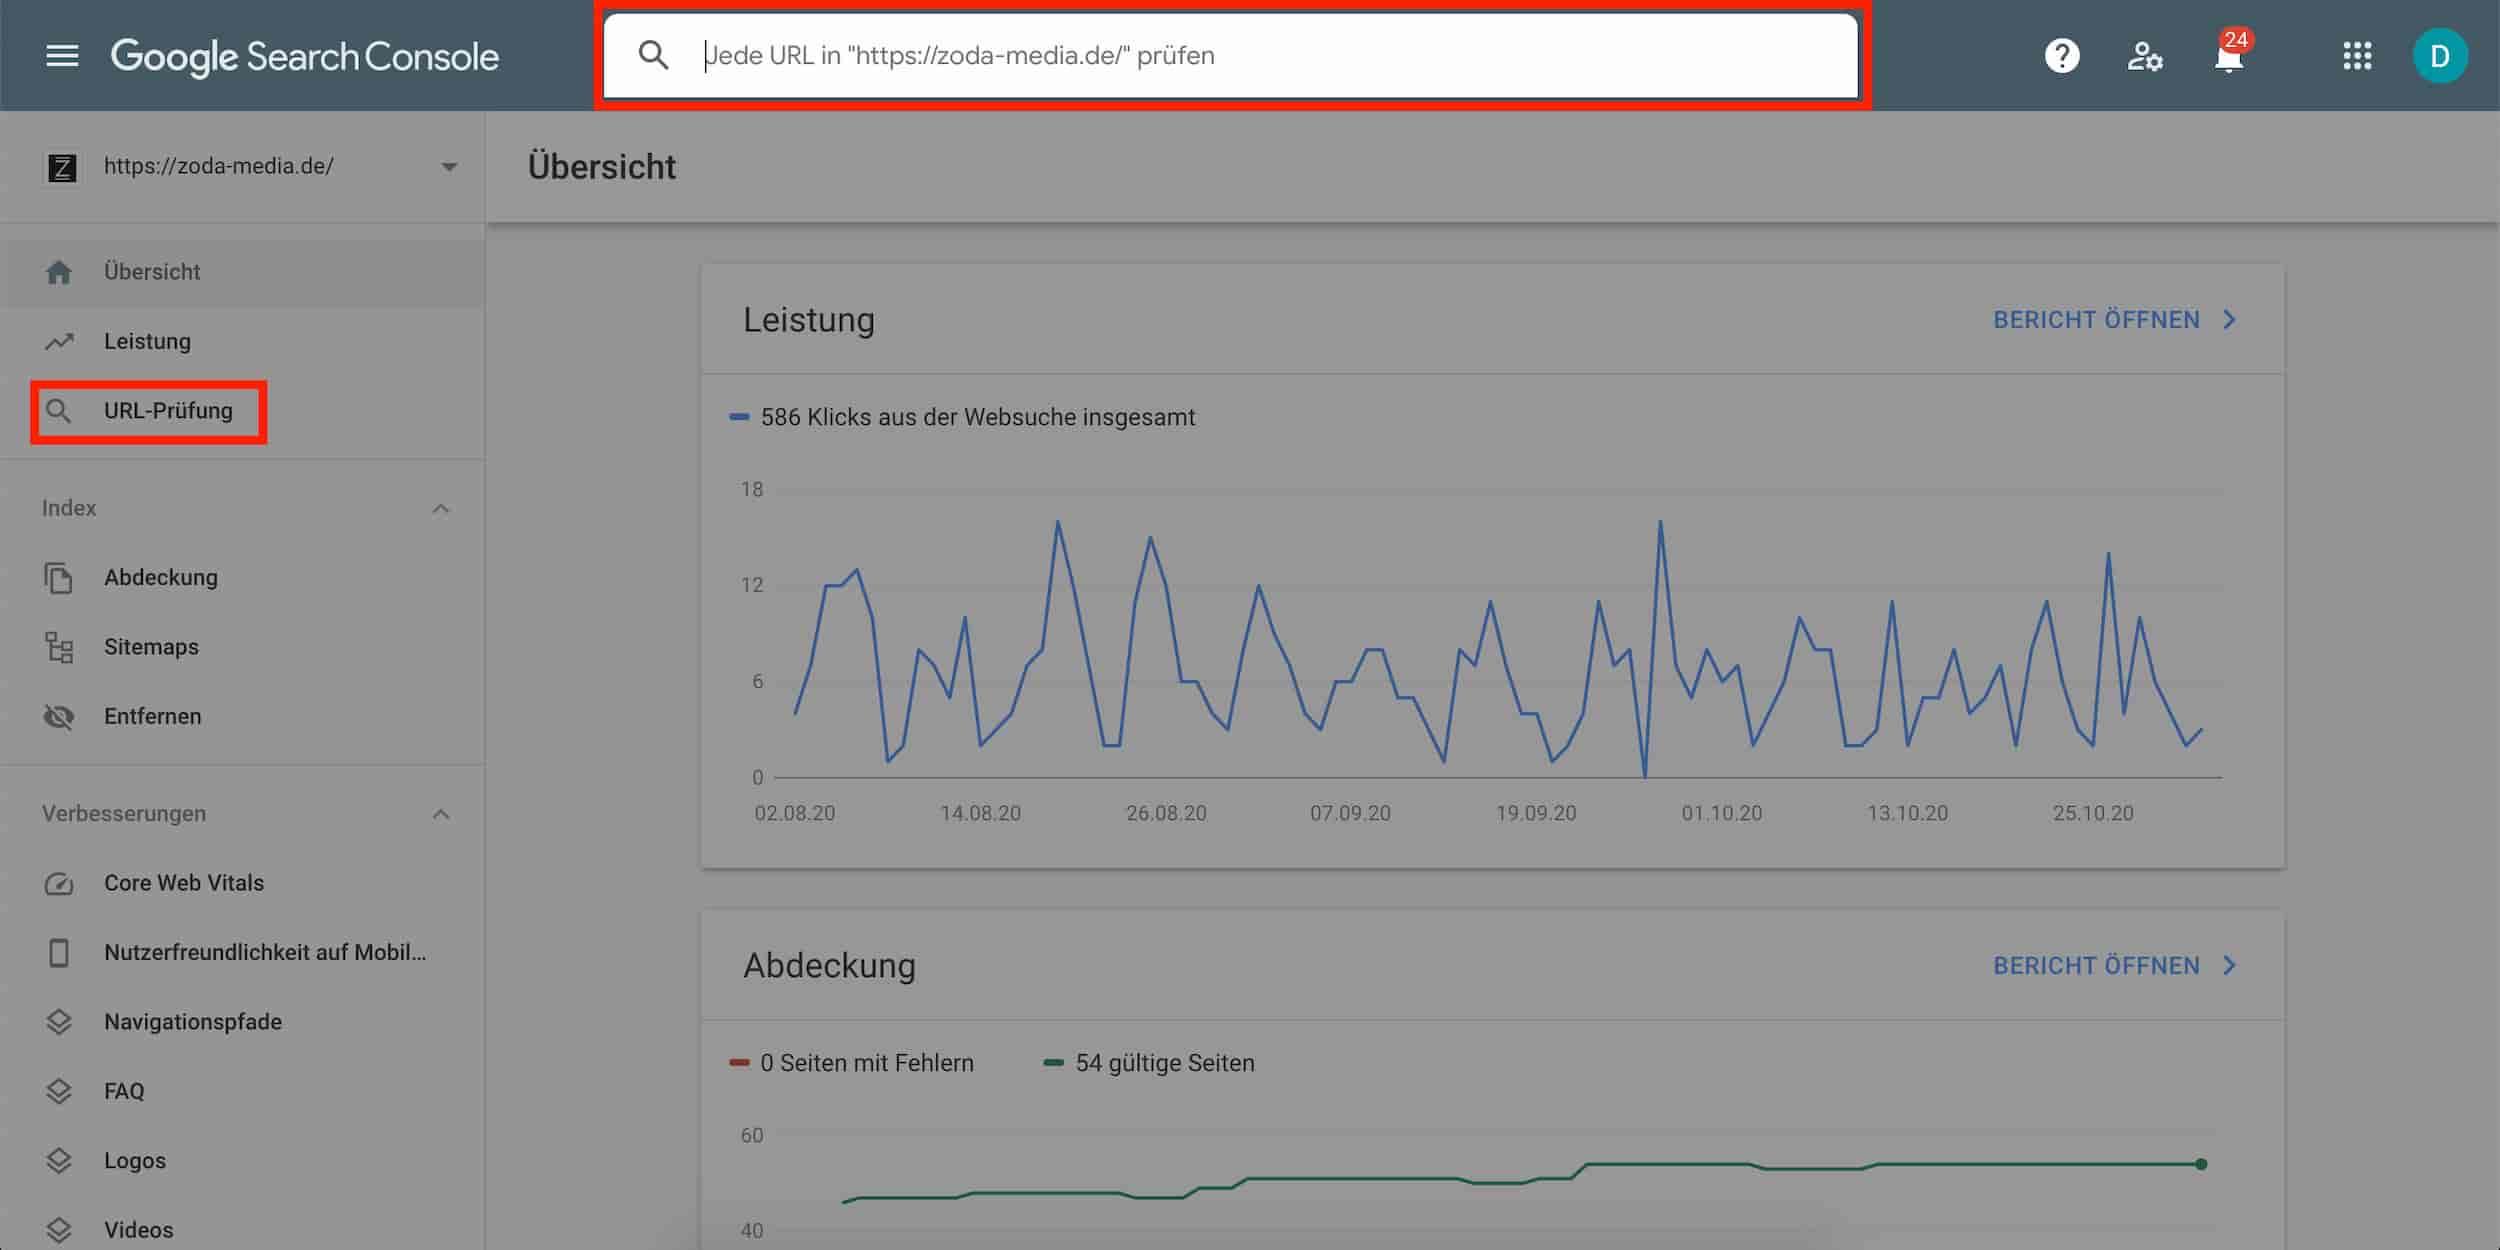 Google_Search_Console_URL_Pruefung